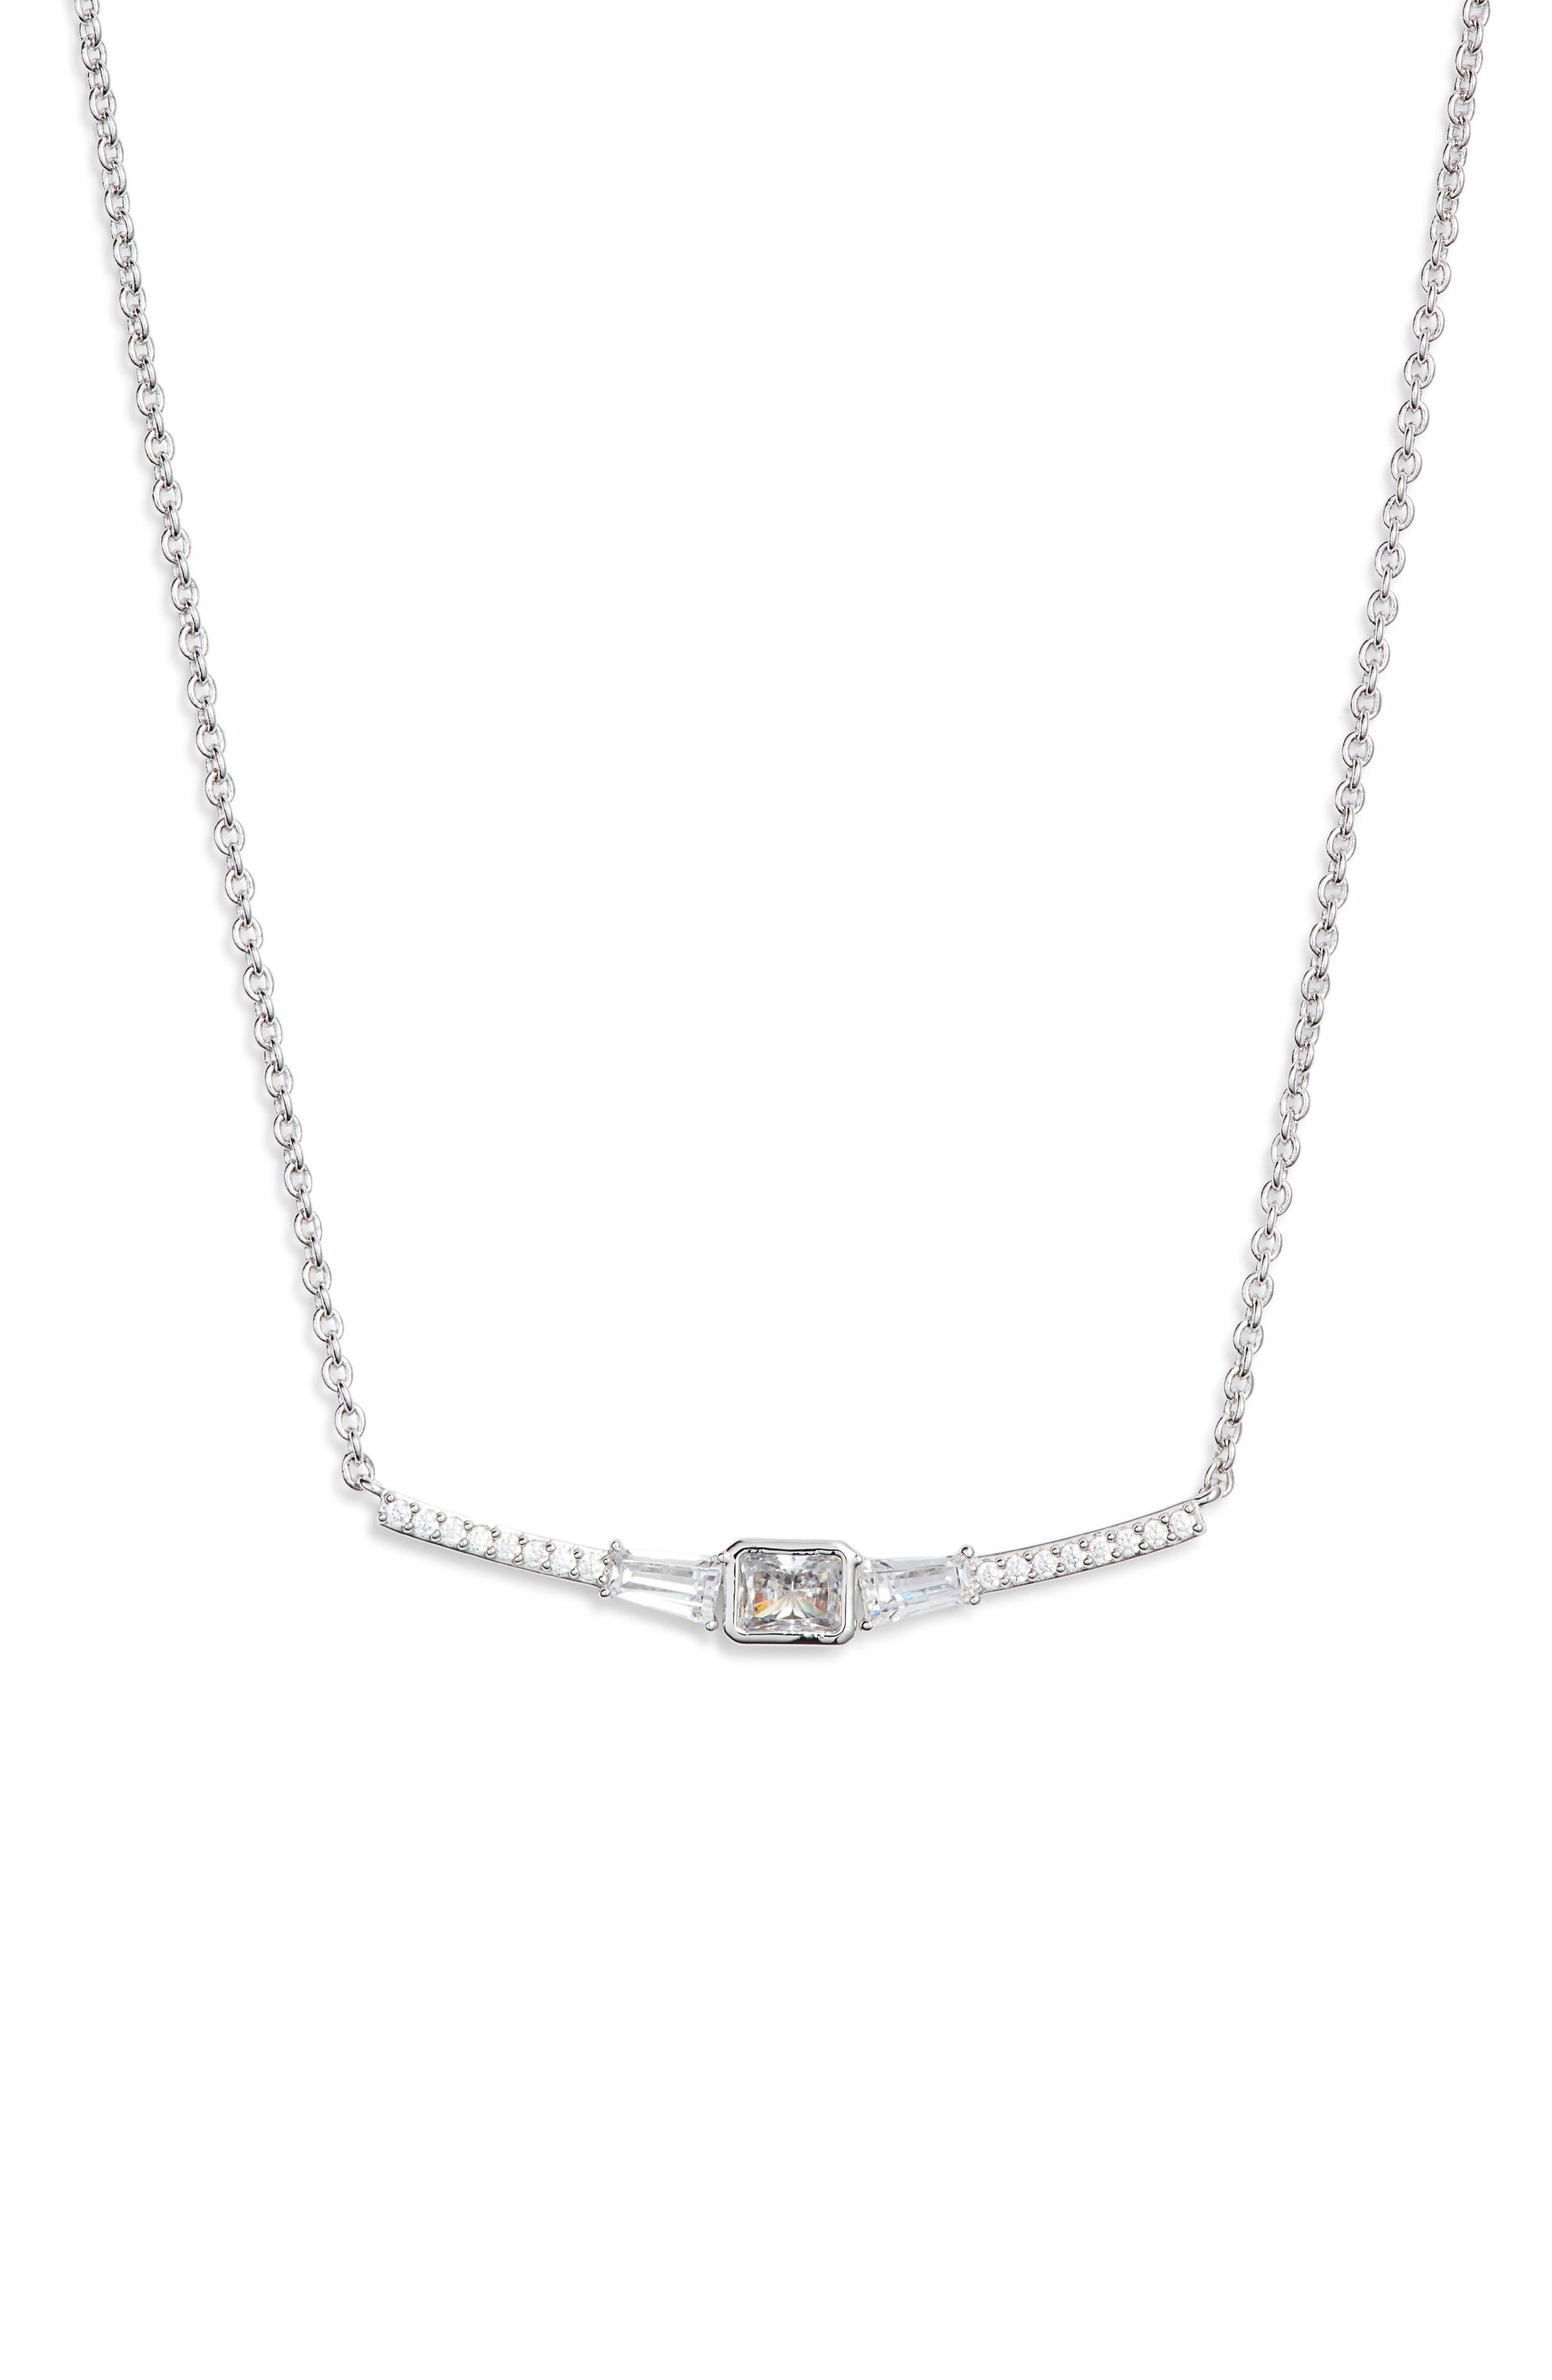 NADRI Baguette Bar Necklace in White